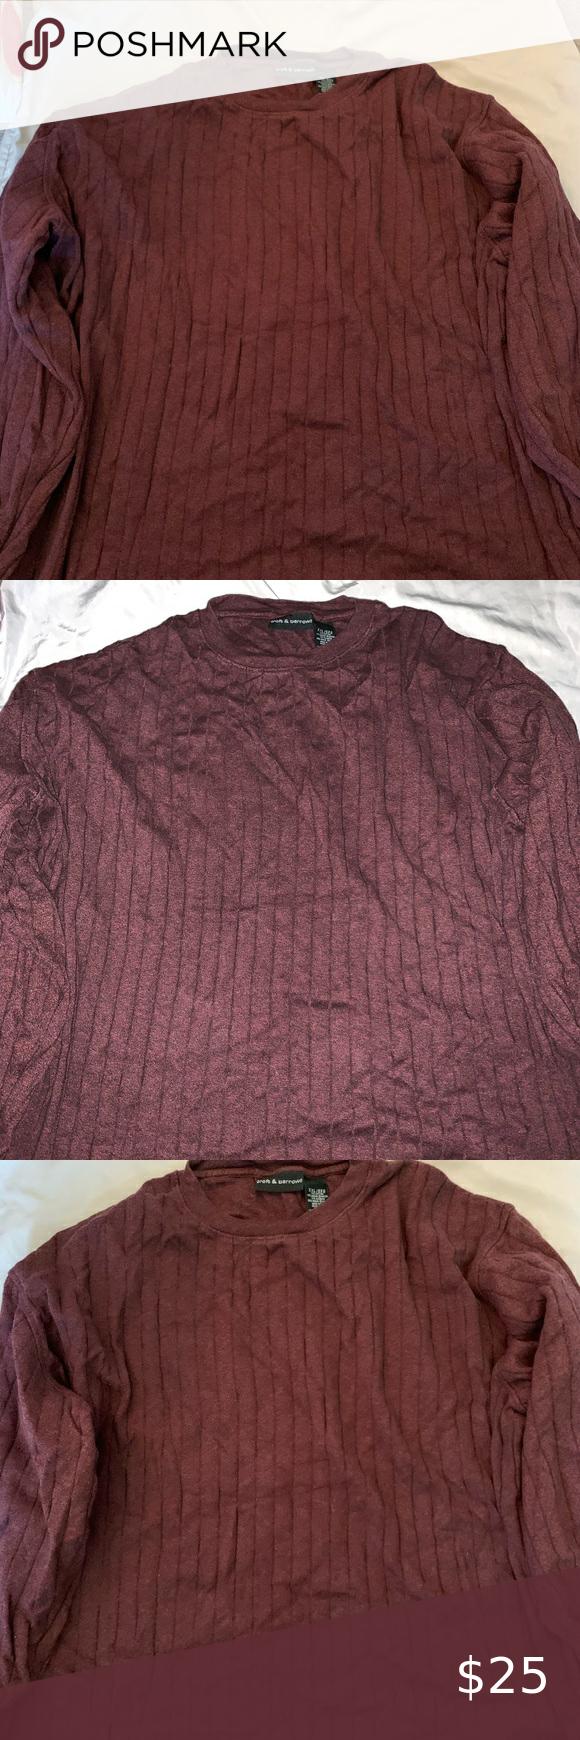 Croft And Barrow Crewneck Sweater Crew Neck Men S Sweater From Croft And Barrow Size Xxl I Took A Photo With An Sweaters Crew Neck Sweater Croft And Barrow [ 1740 x 580 Pixel ]